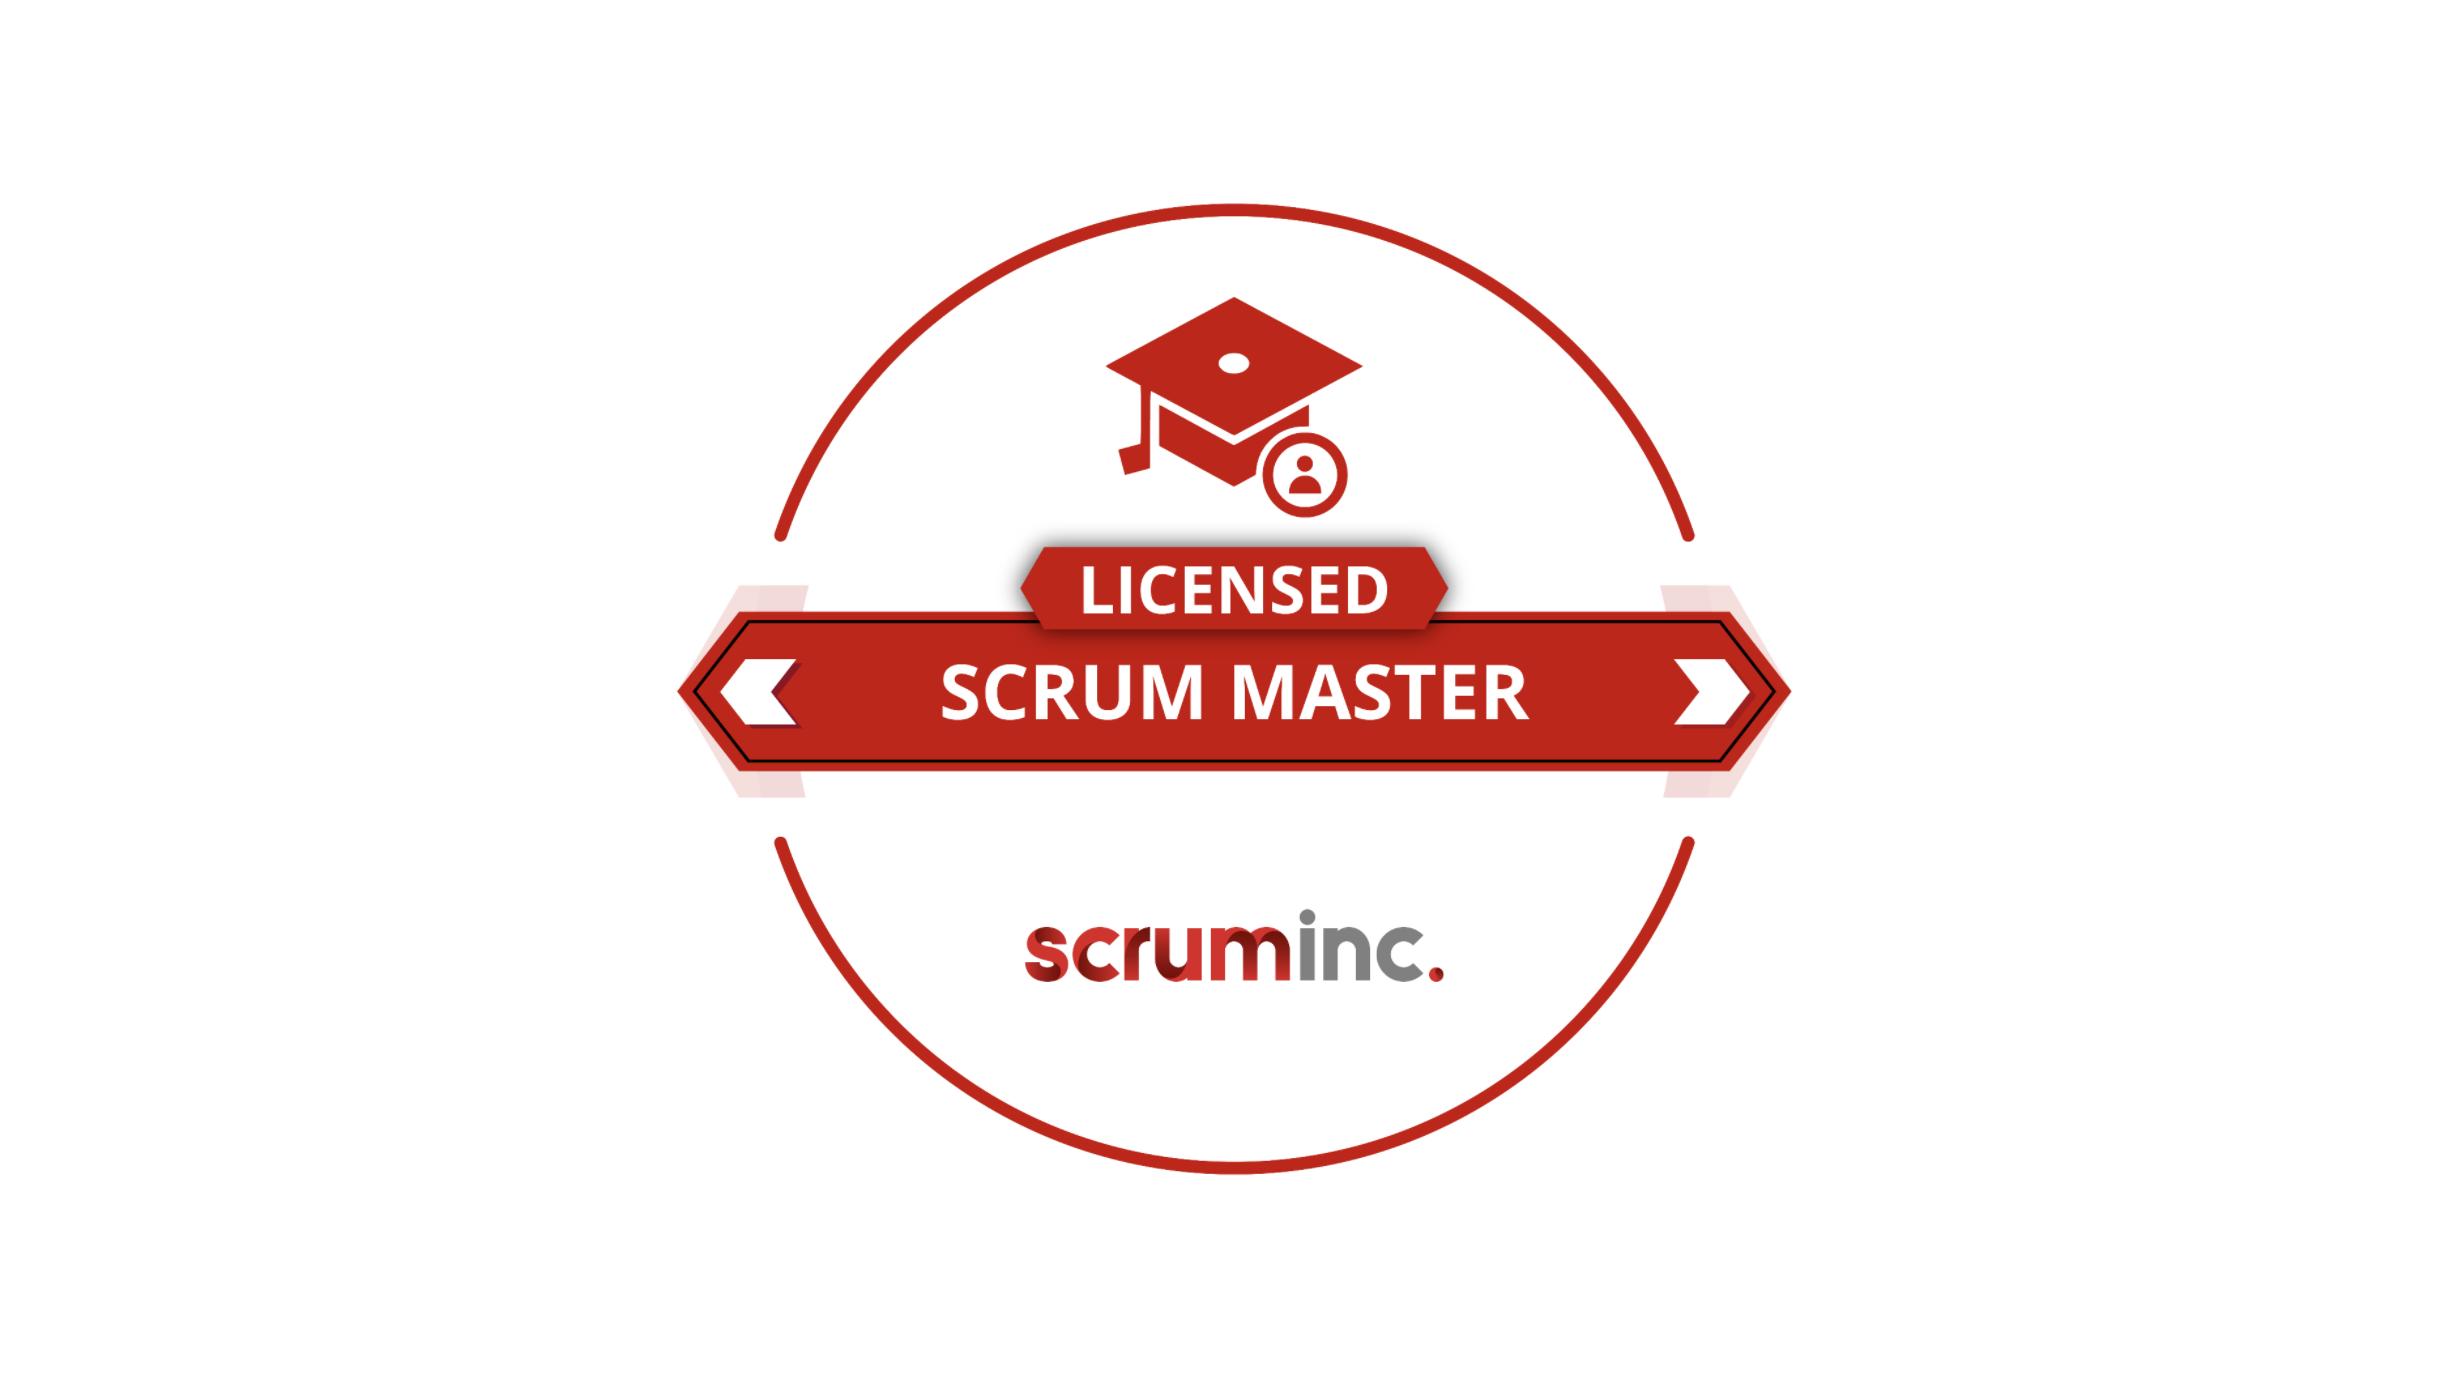 [LSM] 認定スクラムマスター(Licensed Scrum Master)合格体験記/研修概要